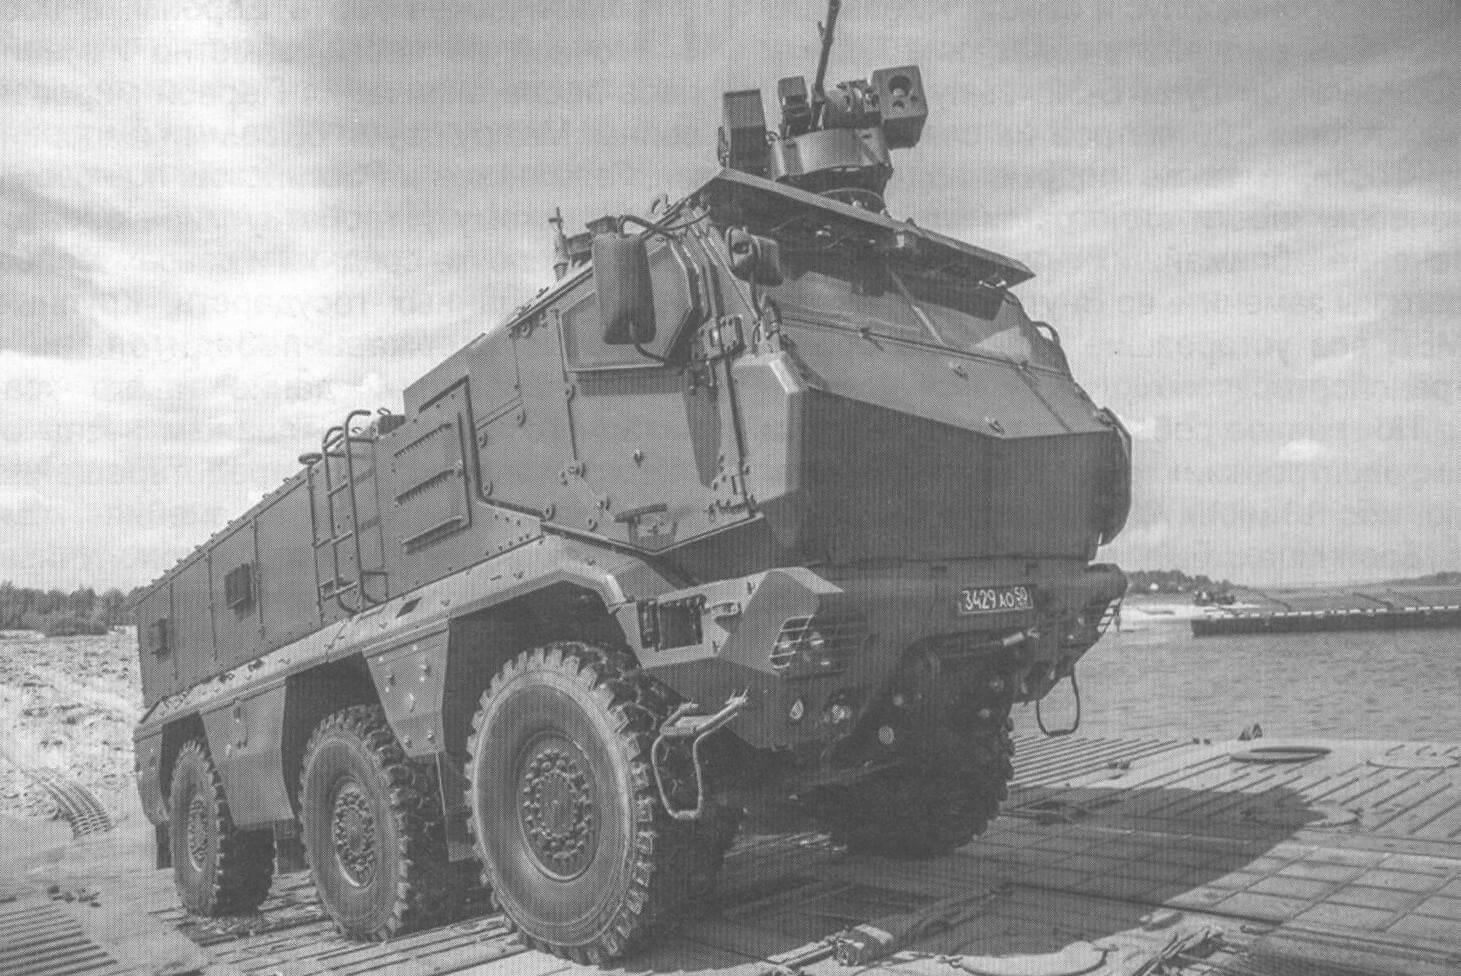 Бронеавтомобиль КамАЗ-63968